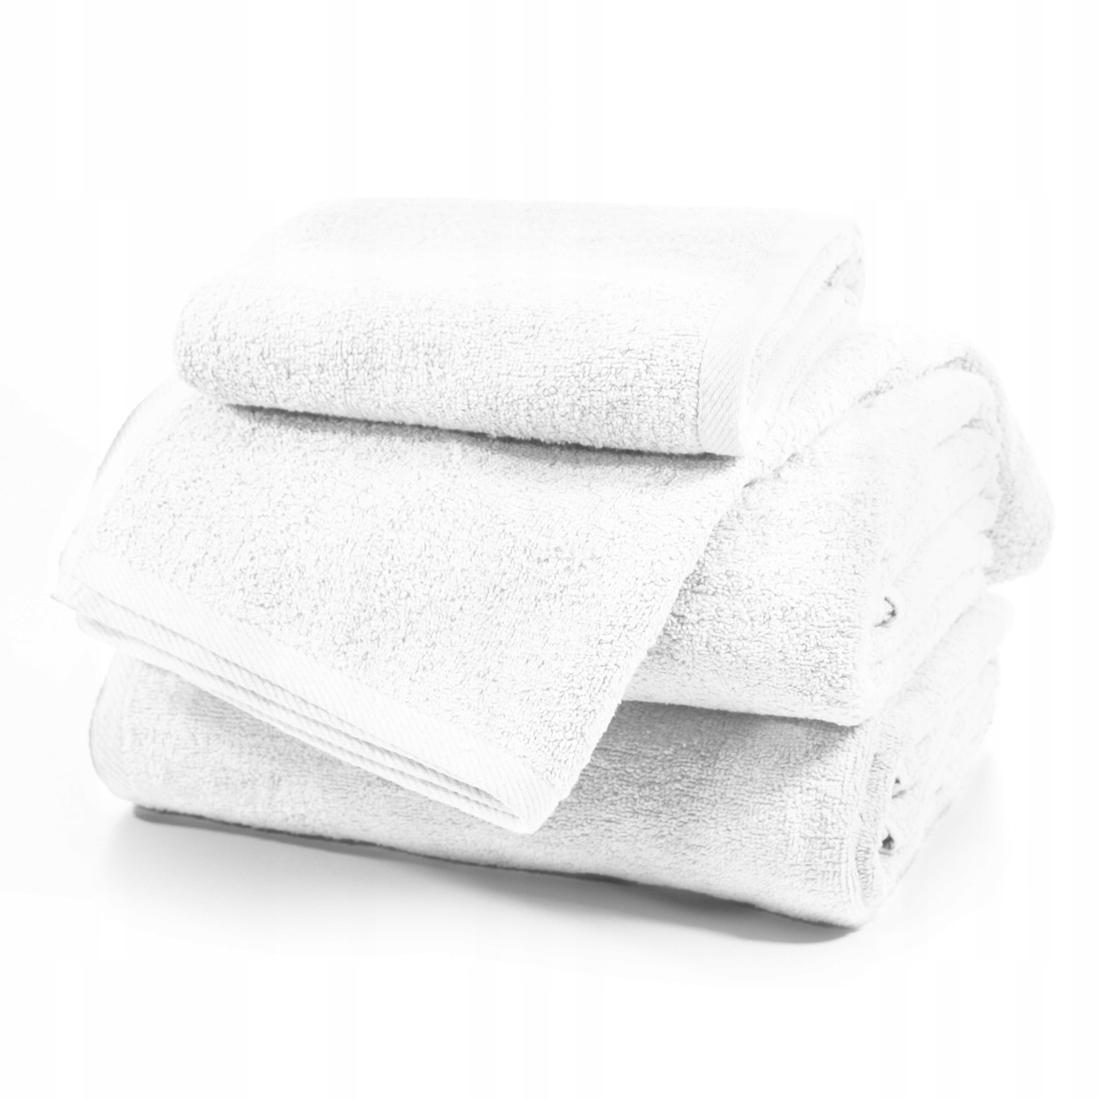 4 TOWELS VENUS SET 2шт 70x140 2шт 50x100